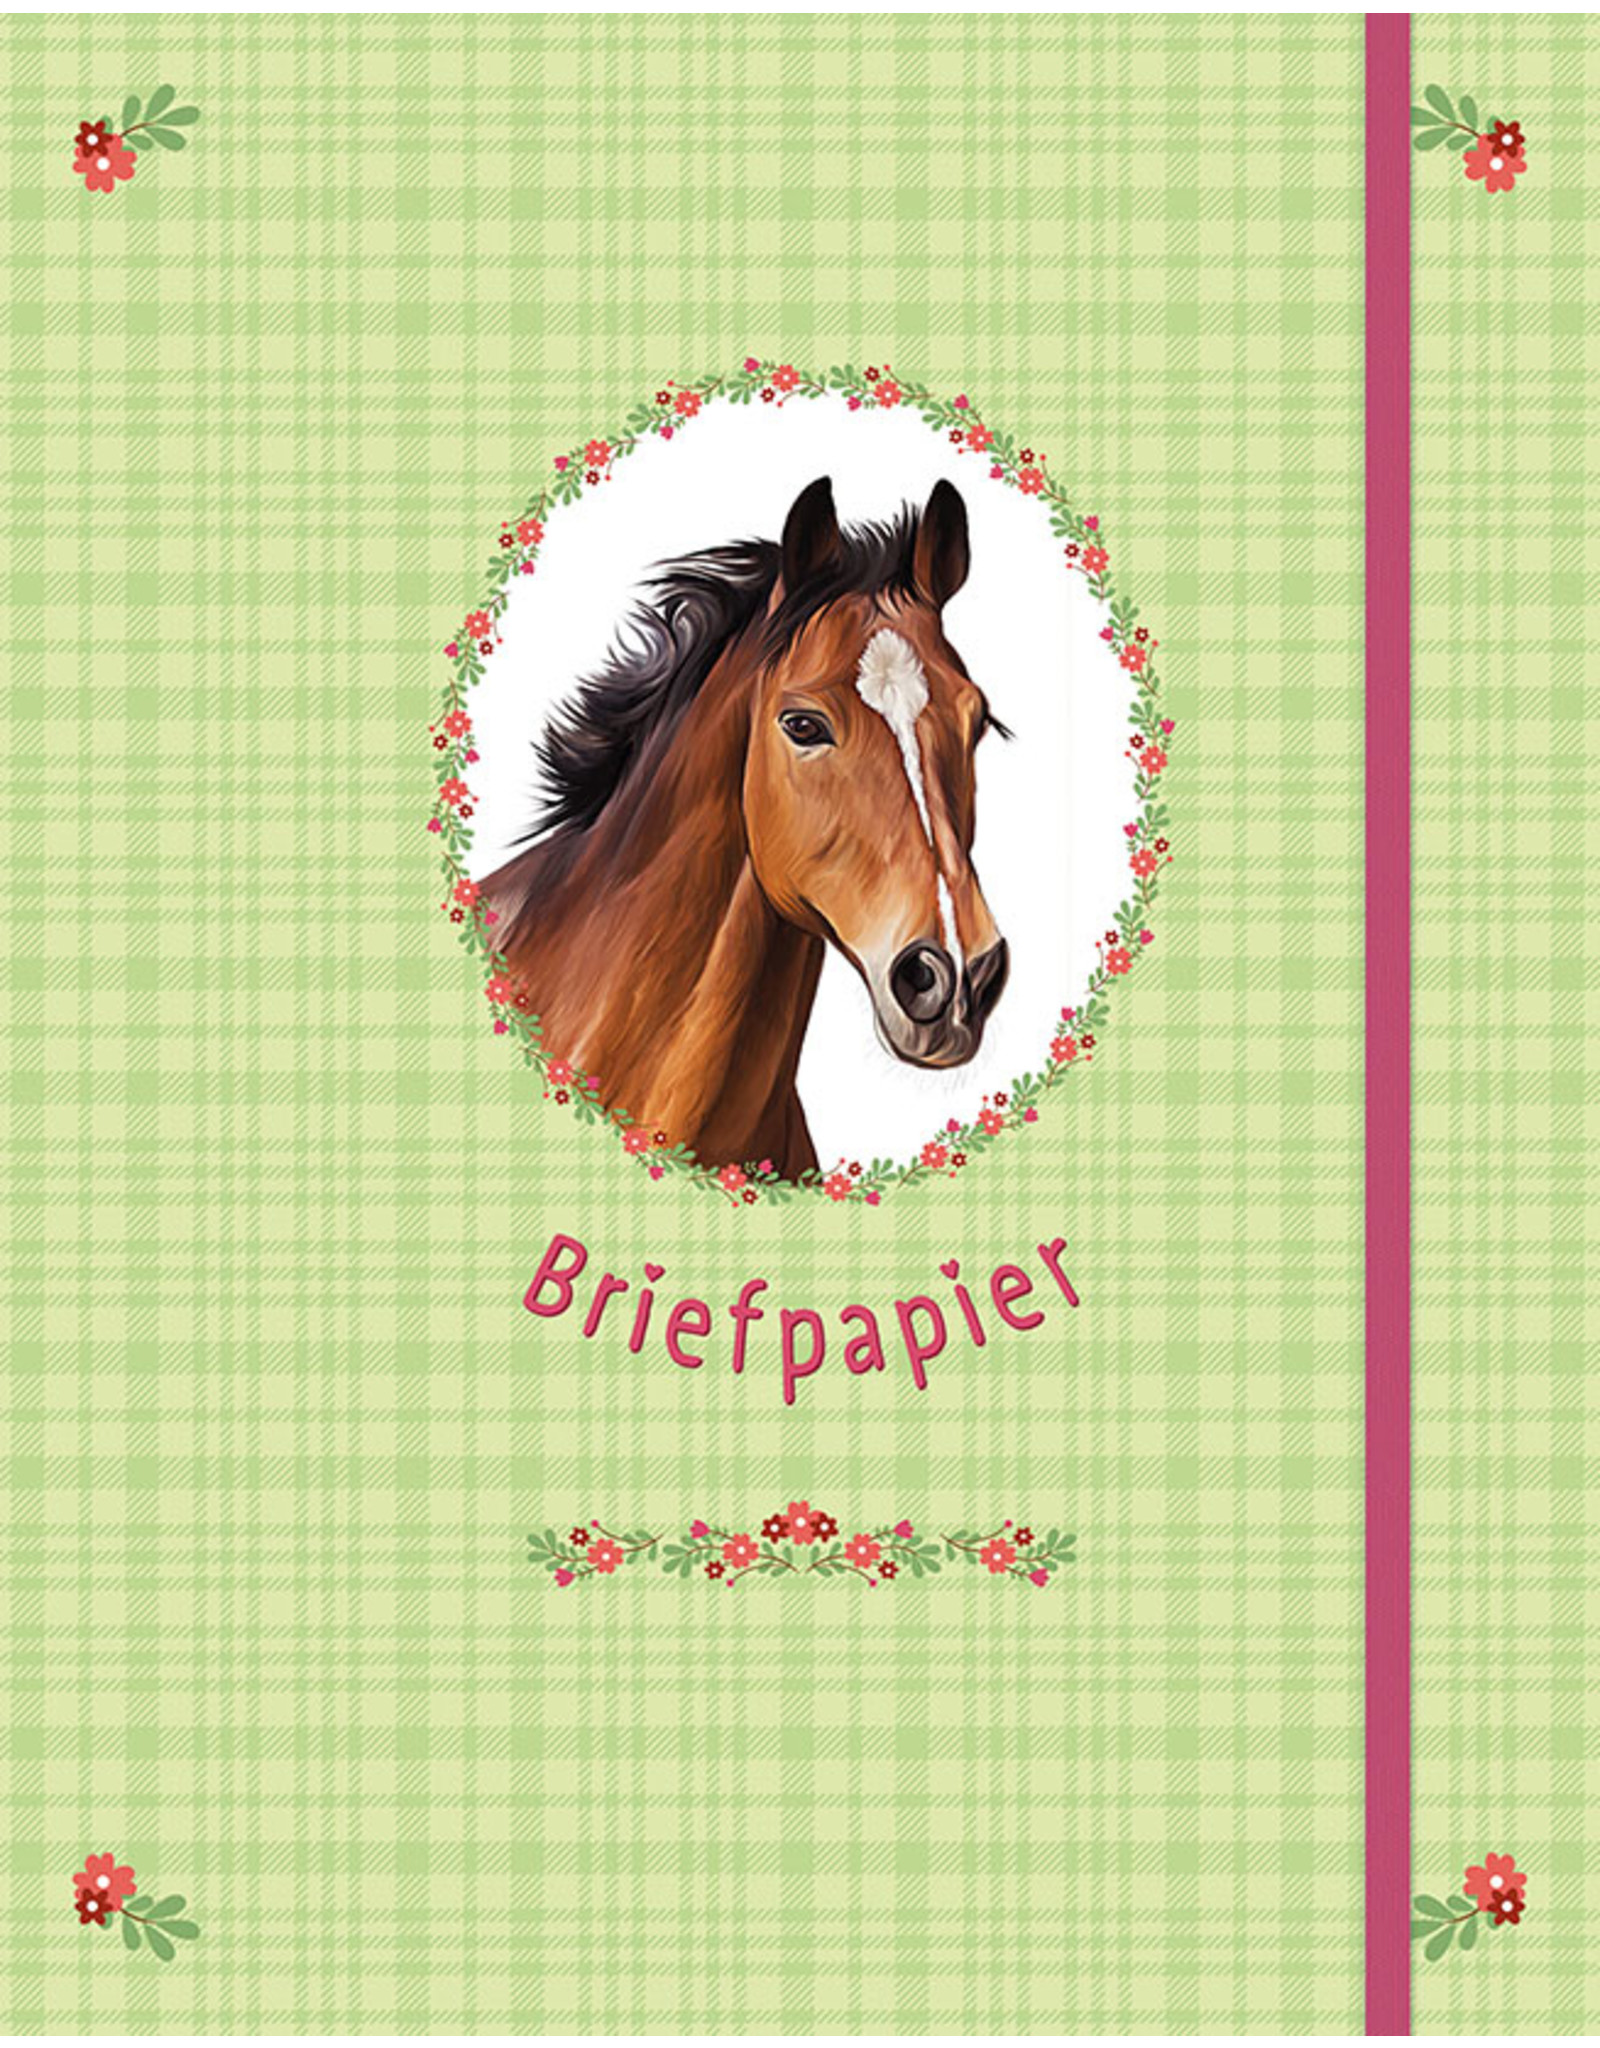 Deltas Briefpapier Paarden